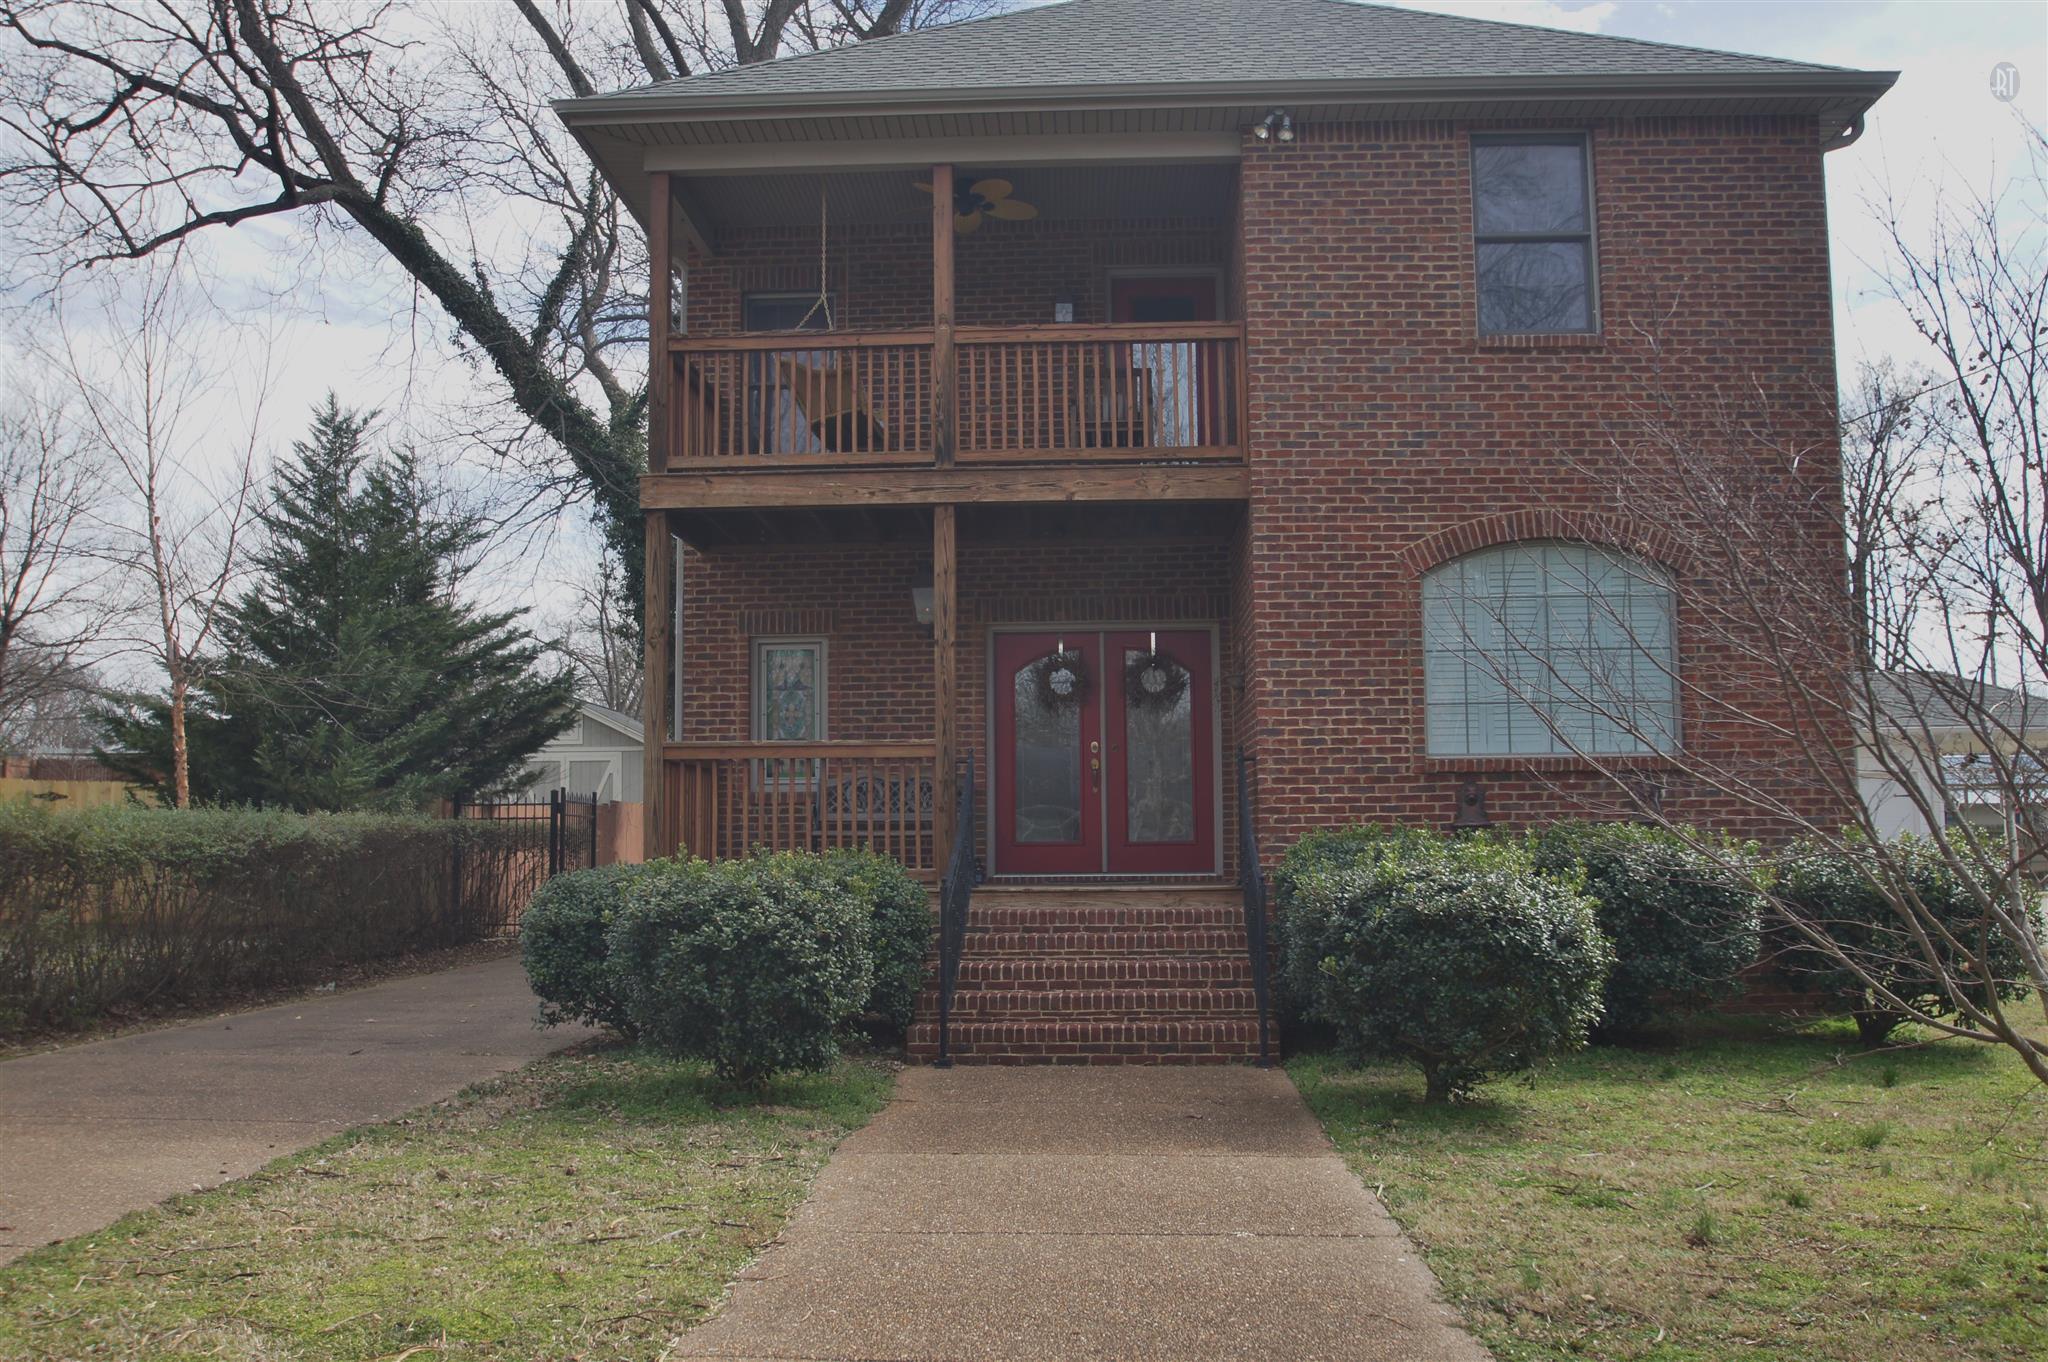 608 N Spring St, Murfreesboro, TN 37130